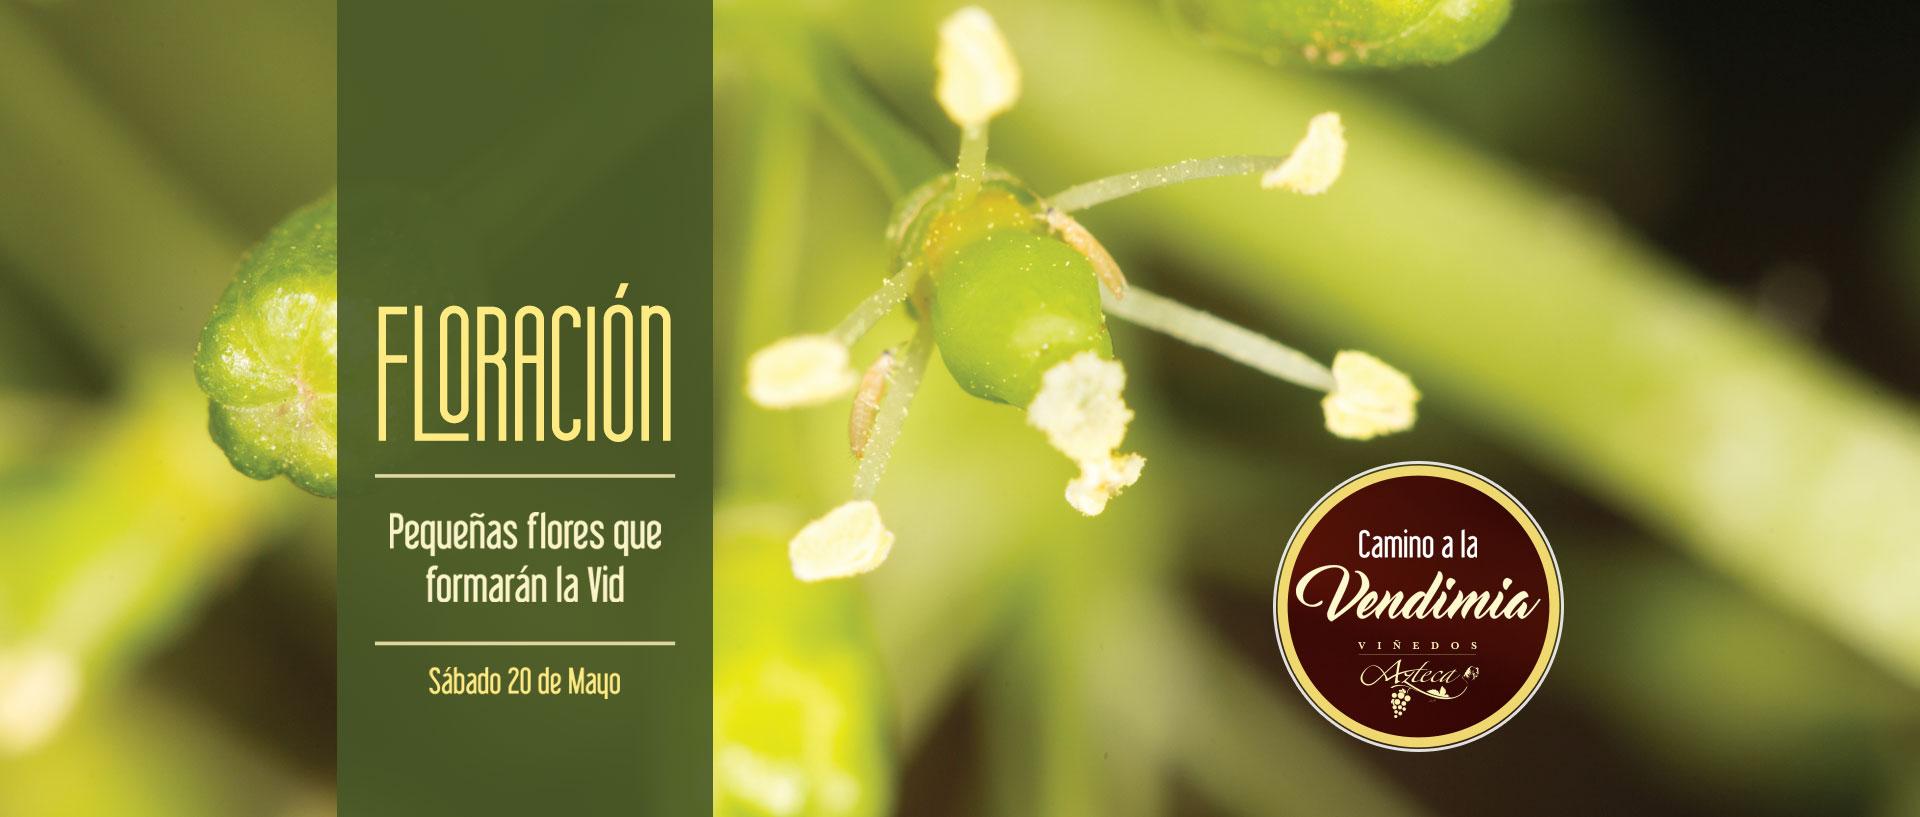 slide-floracion1